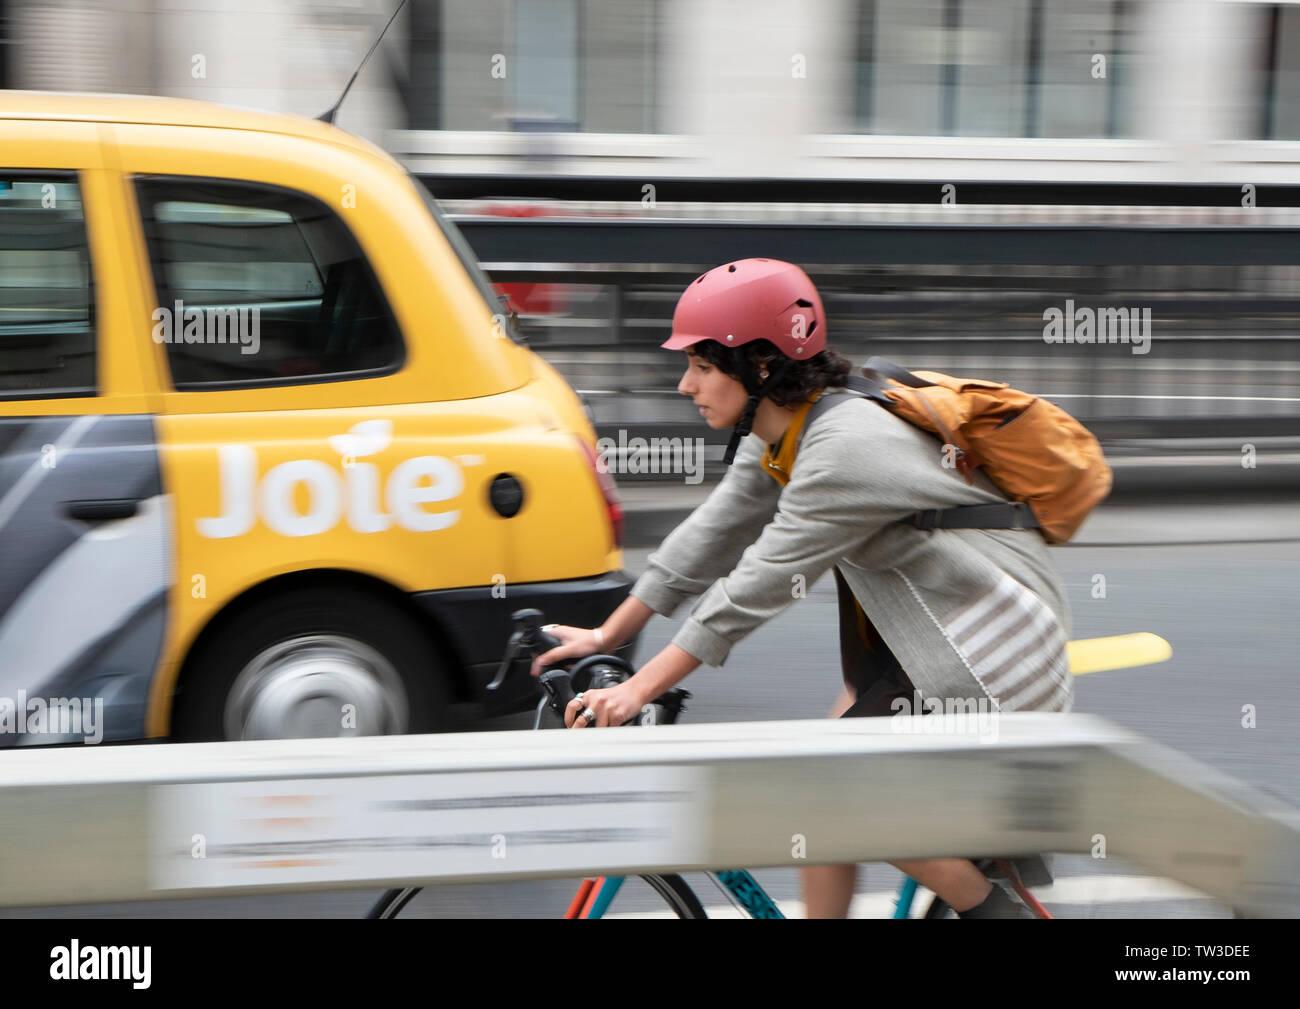 Motion blur capture of a female cyclist entering Waterloo Bridge, London - Stock Image